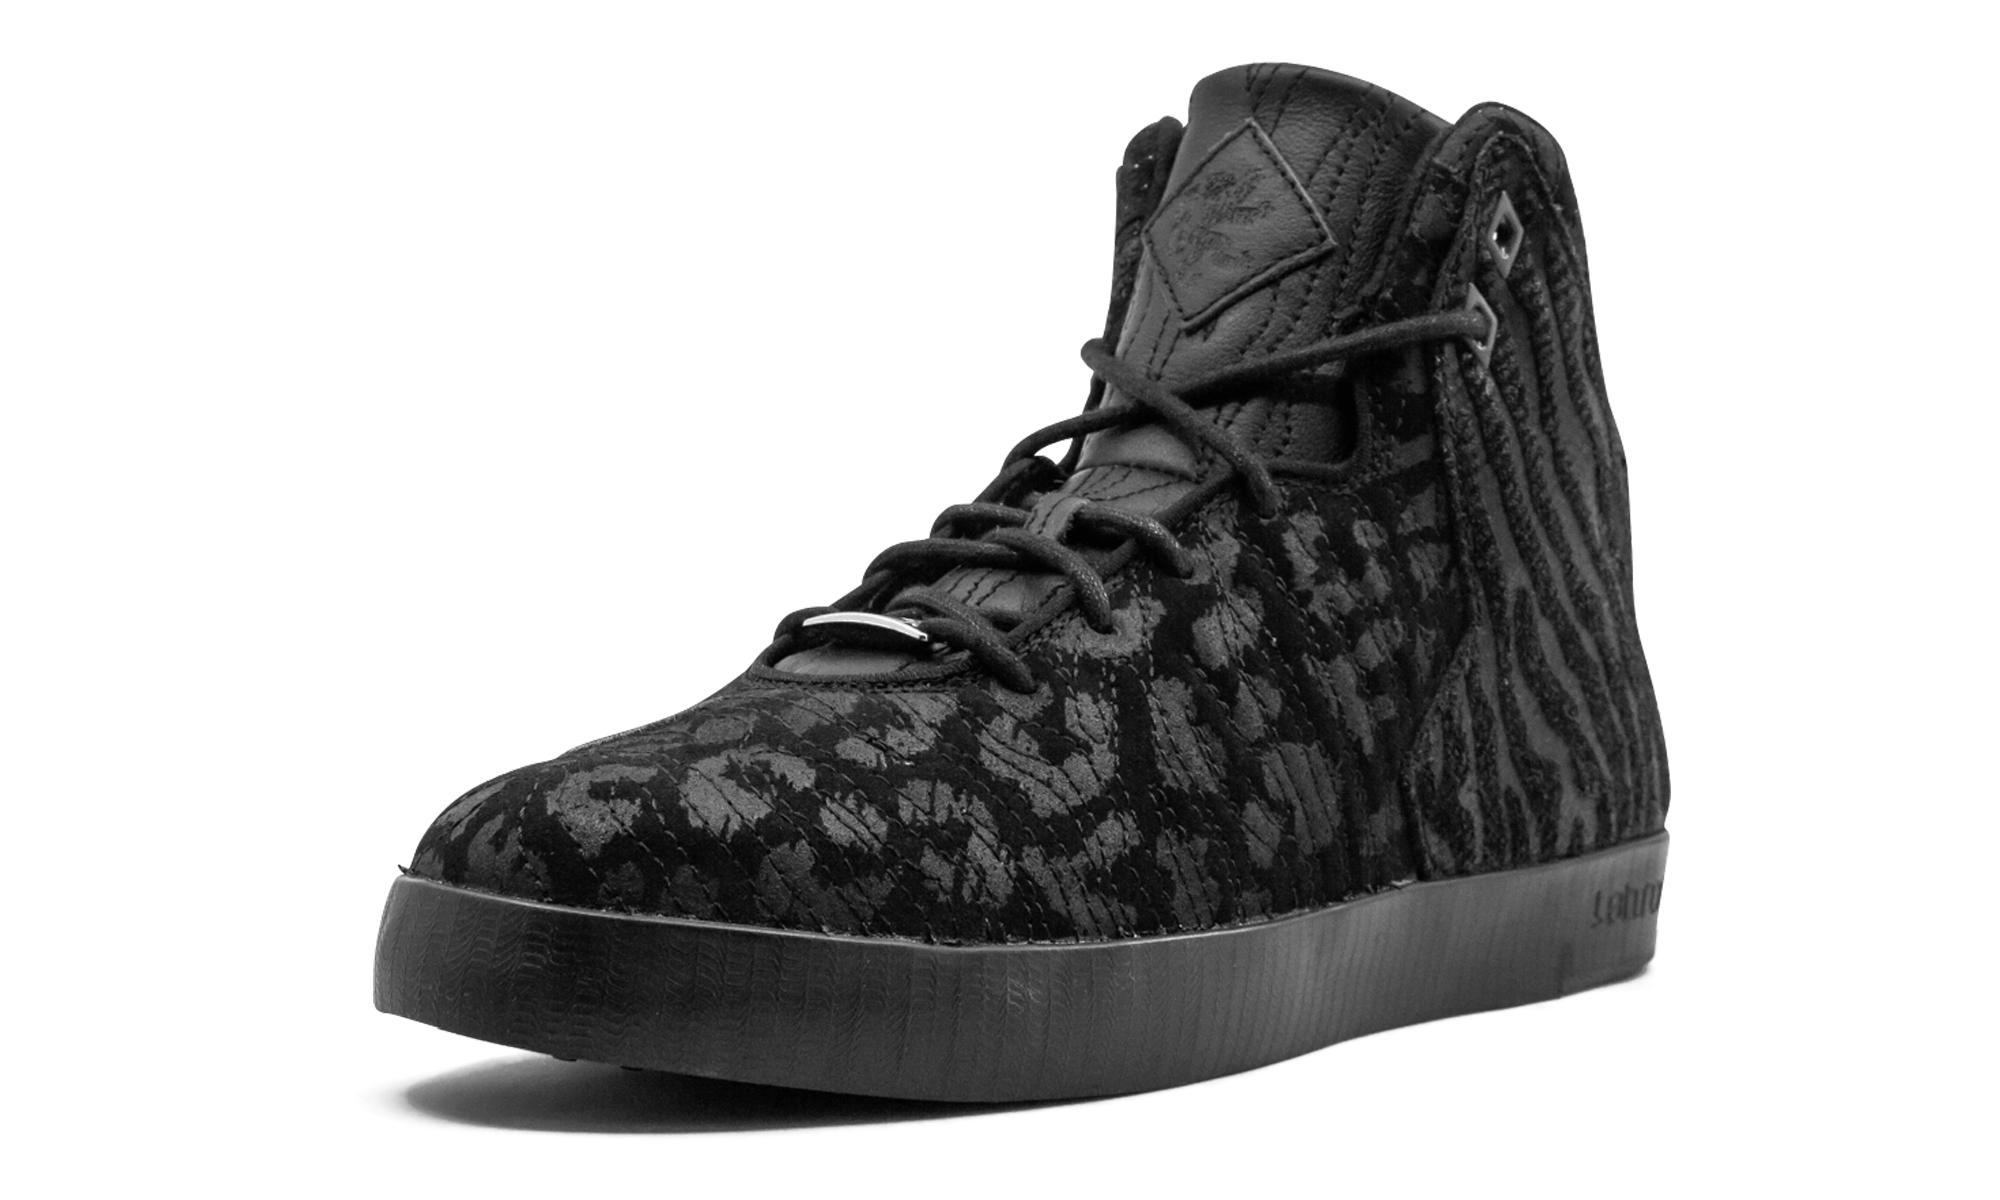 Nike Lebron 11 Nsw Lifestyle in